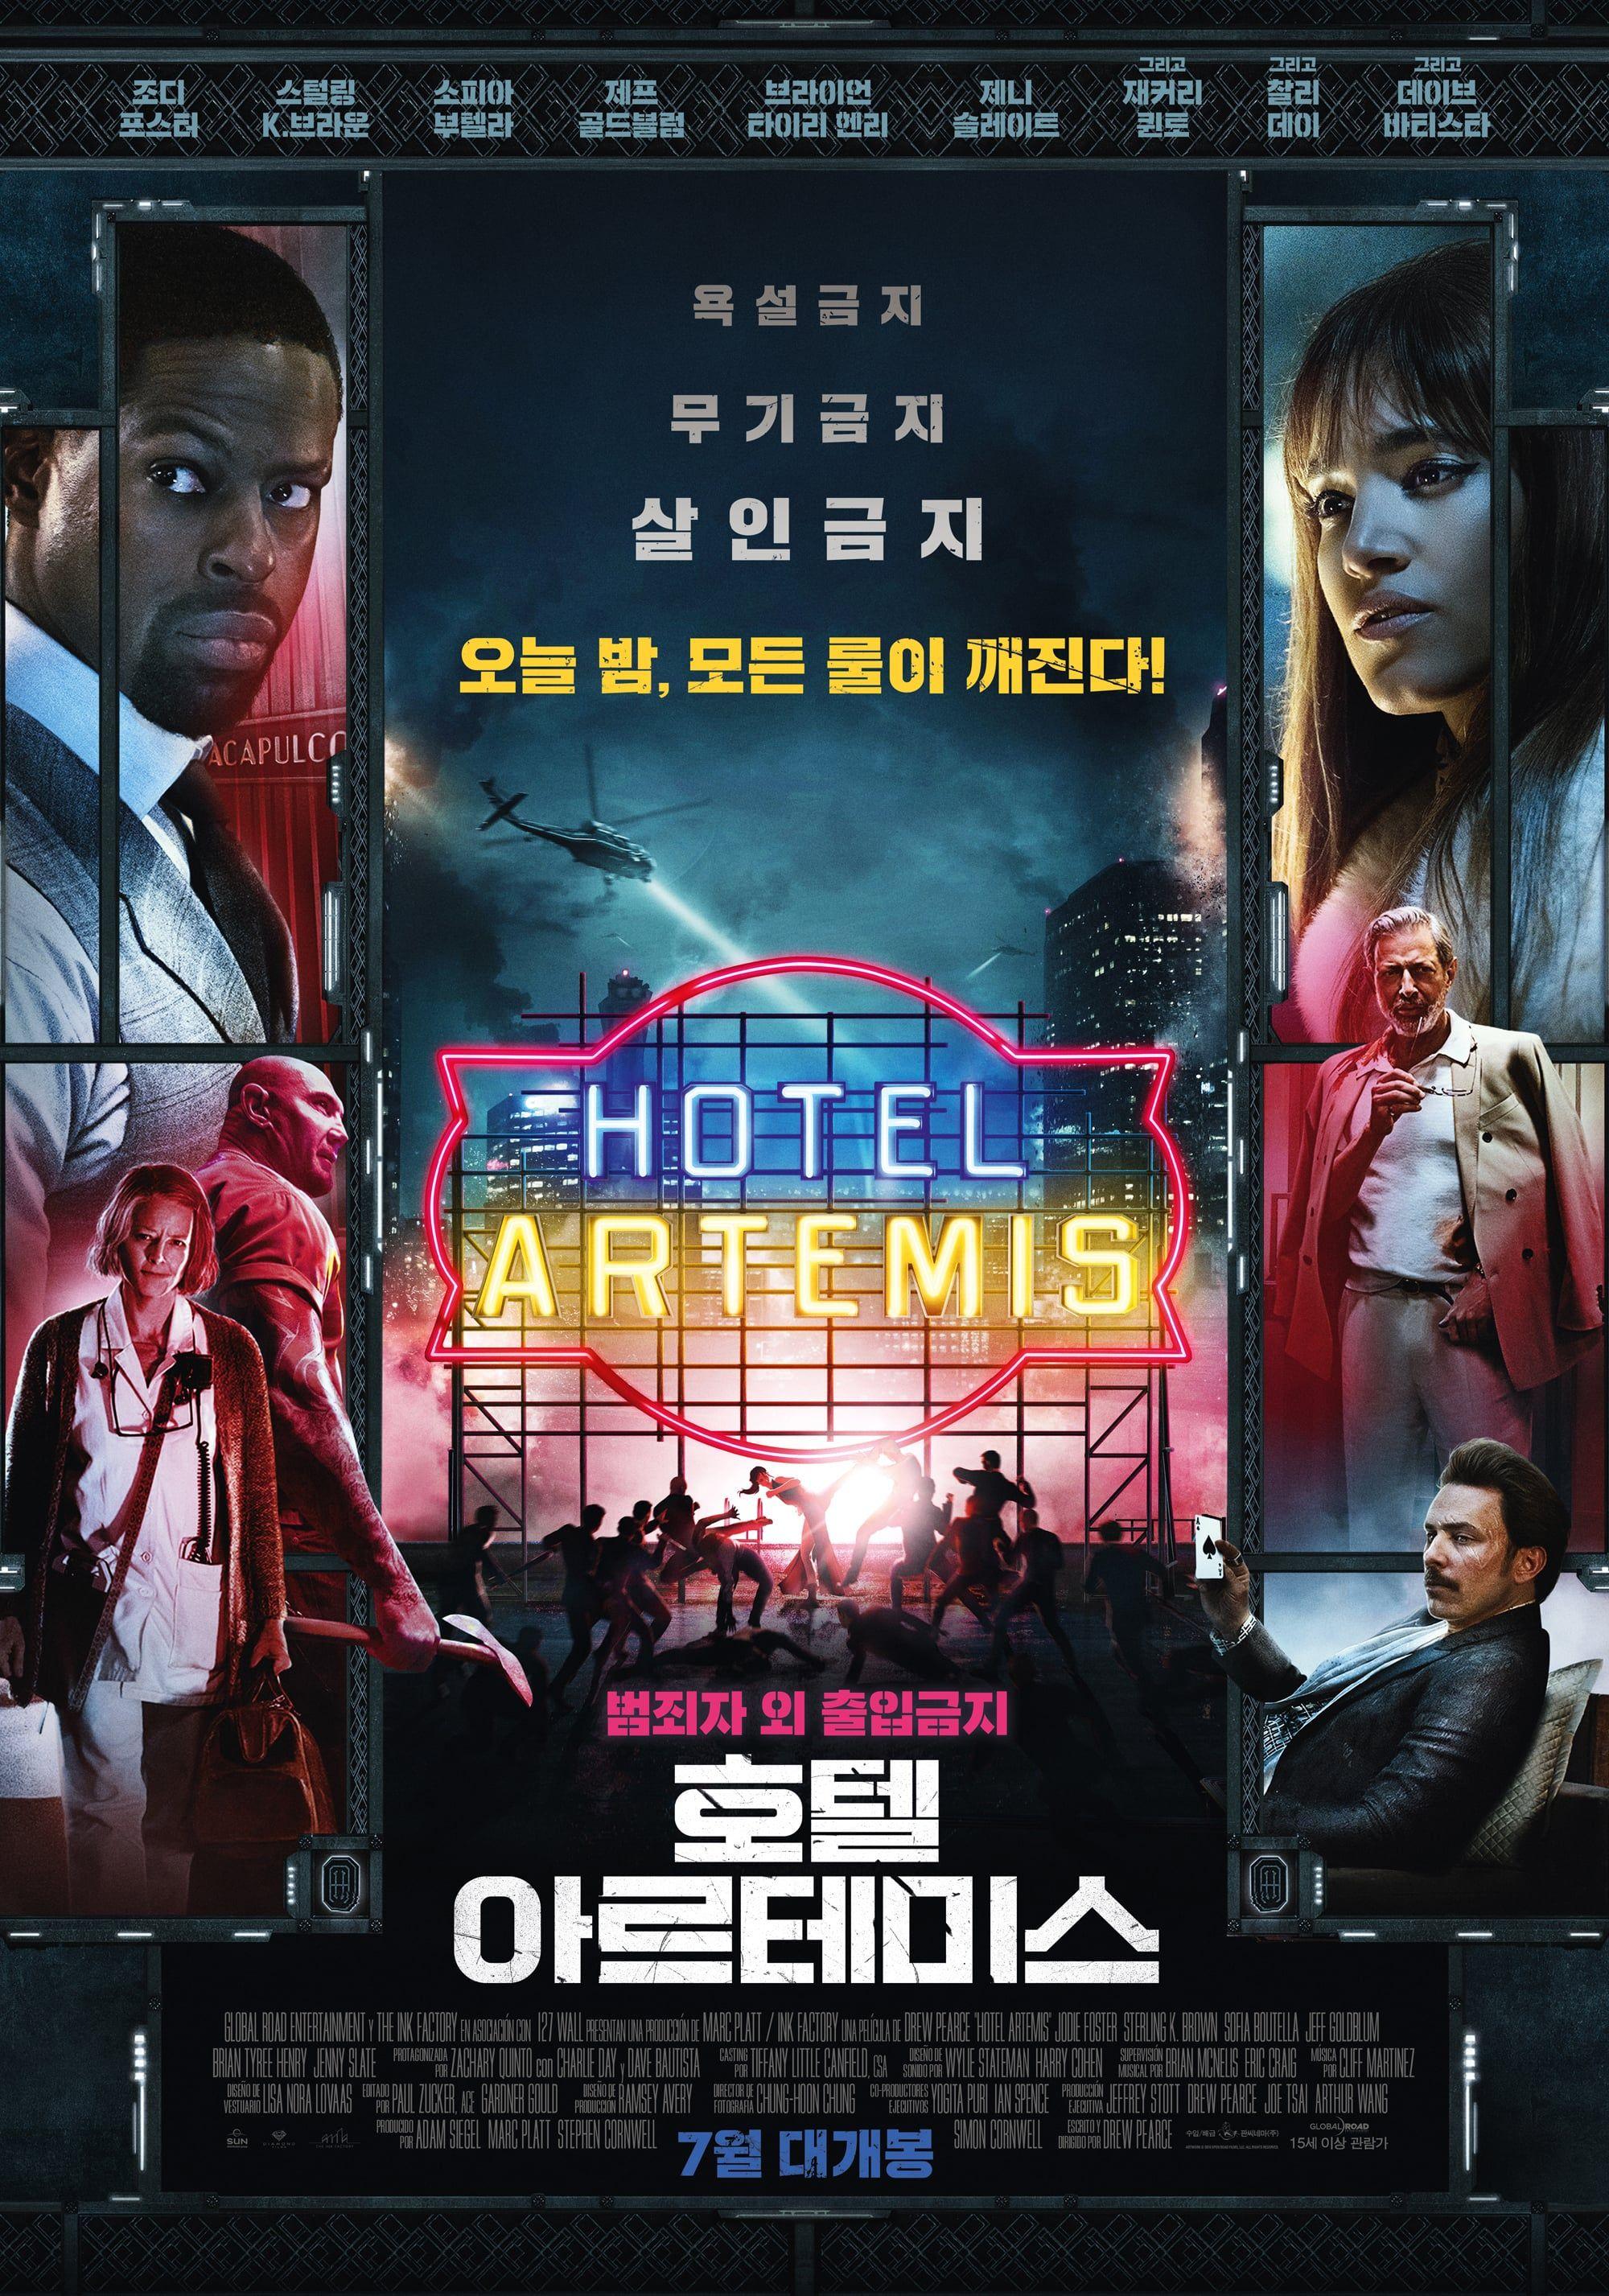 Hotel Artemis FULL MOVIE Streaming Online in HD-720p Video Quality .